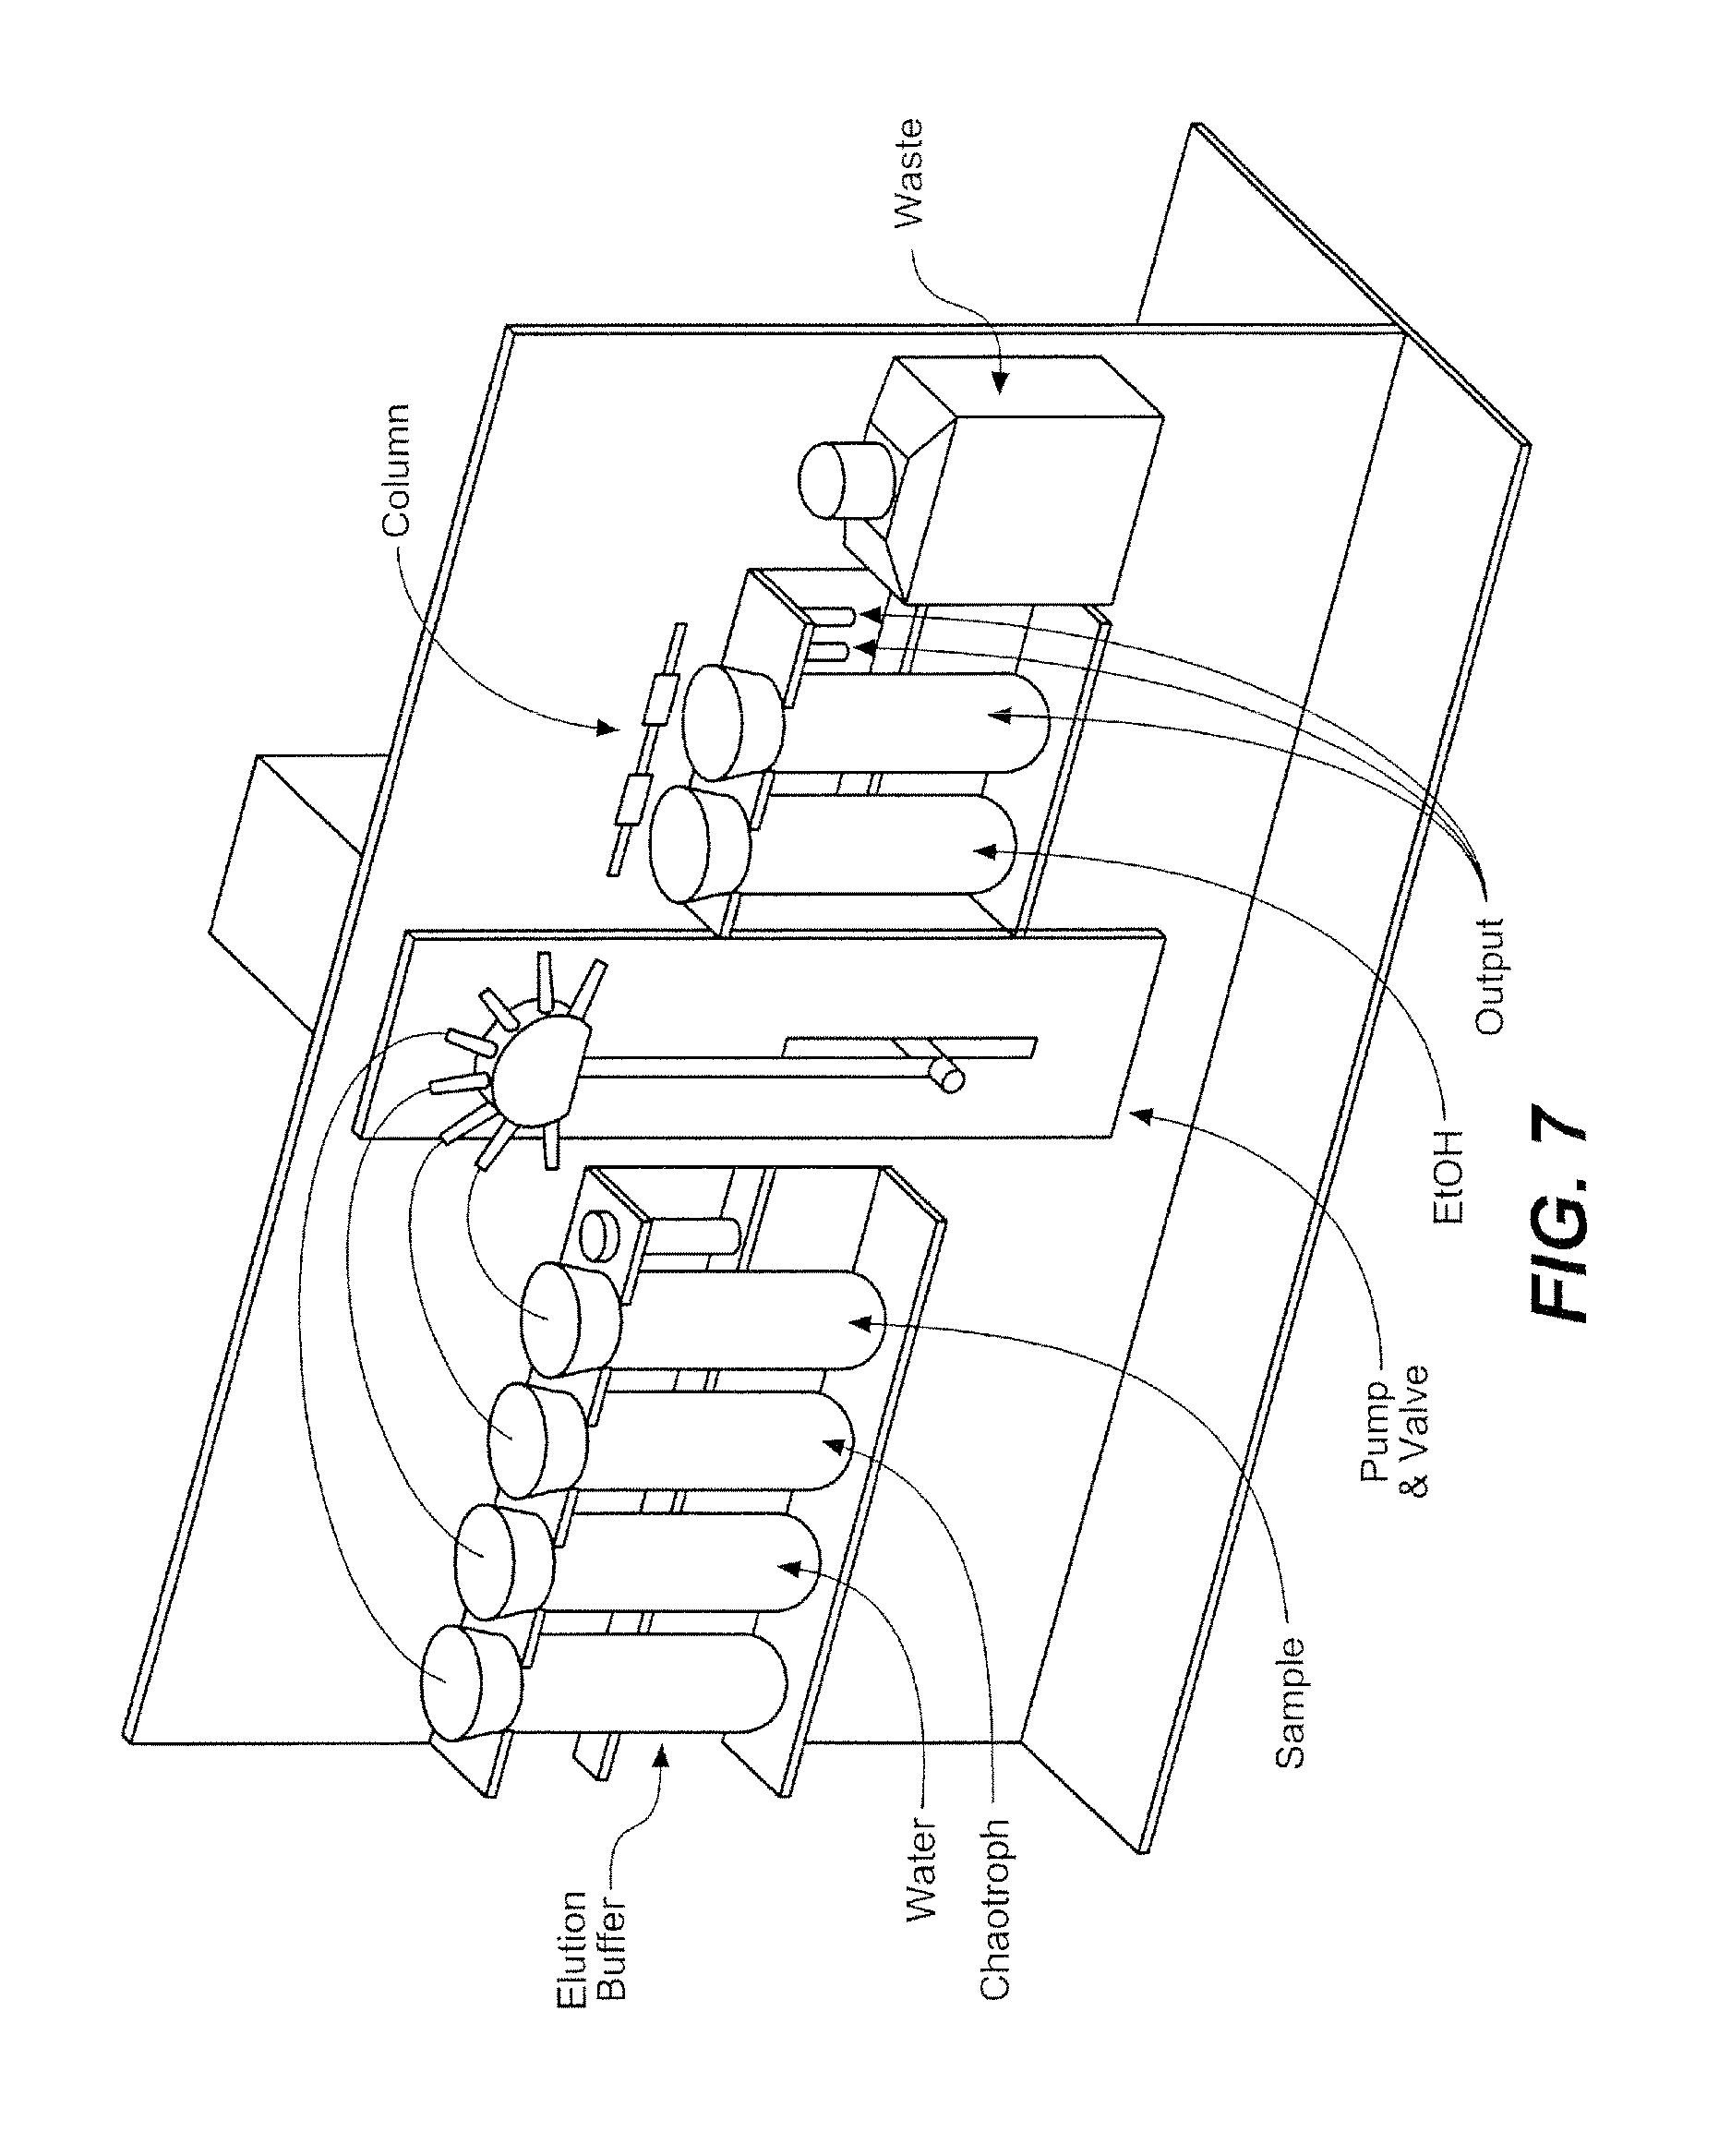 patent us 9 752 185 b2 24V Oil Pump patent